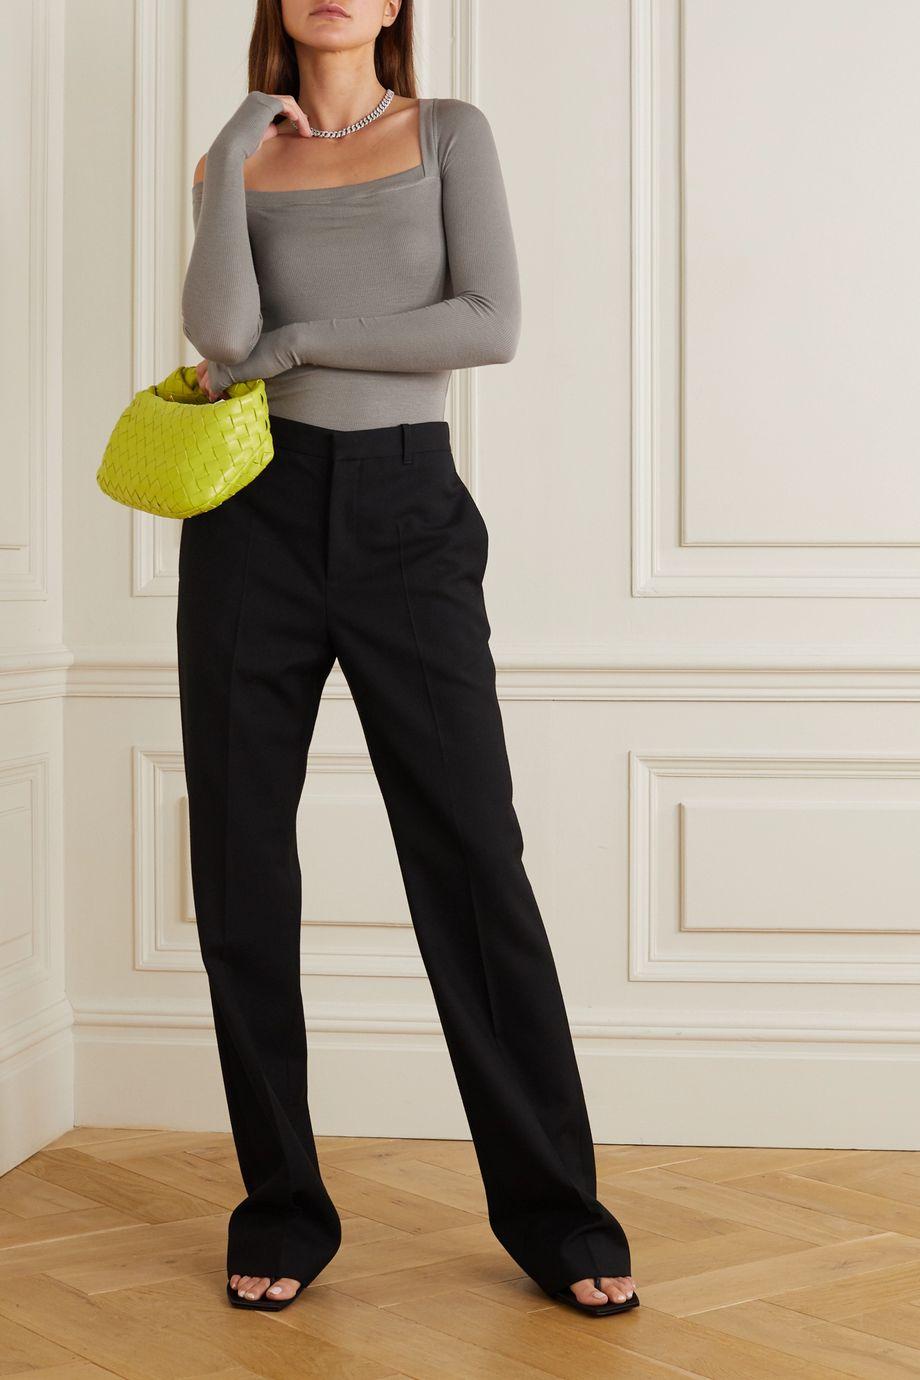 Alix NYC Hester 单肩罗纹弹力平纹布连体丁字裤式紧身衣